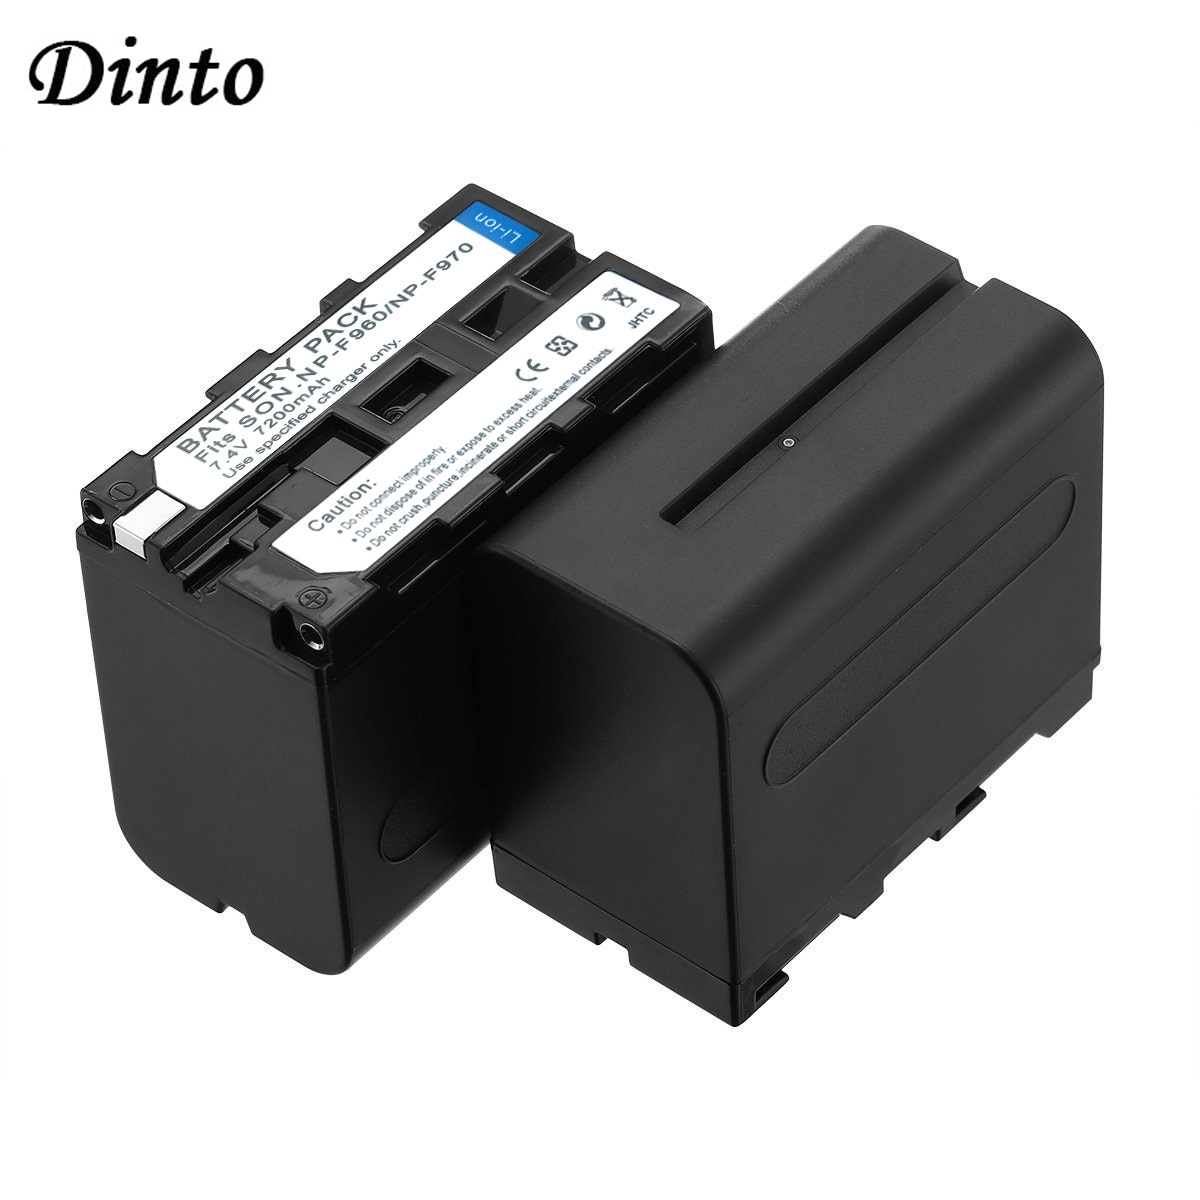 Dinto 2 uds 7200mAh NP-F950 F960 F970 F750 F750A F760 de batería...